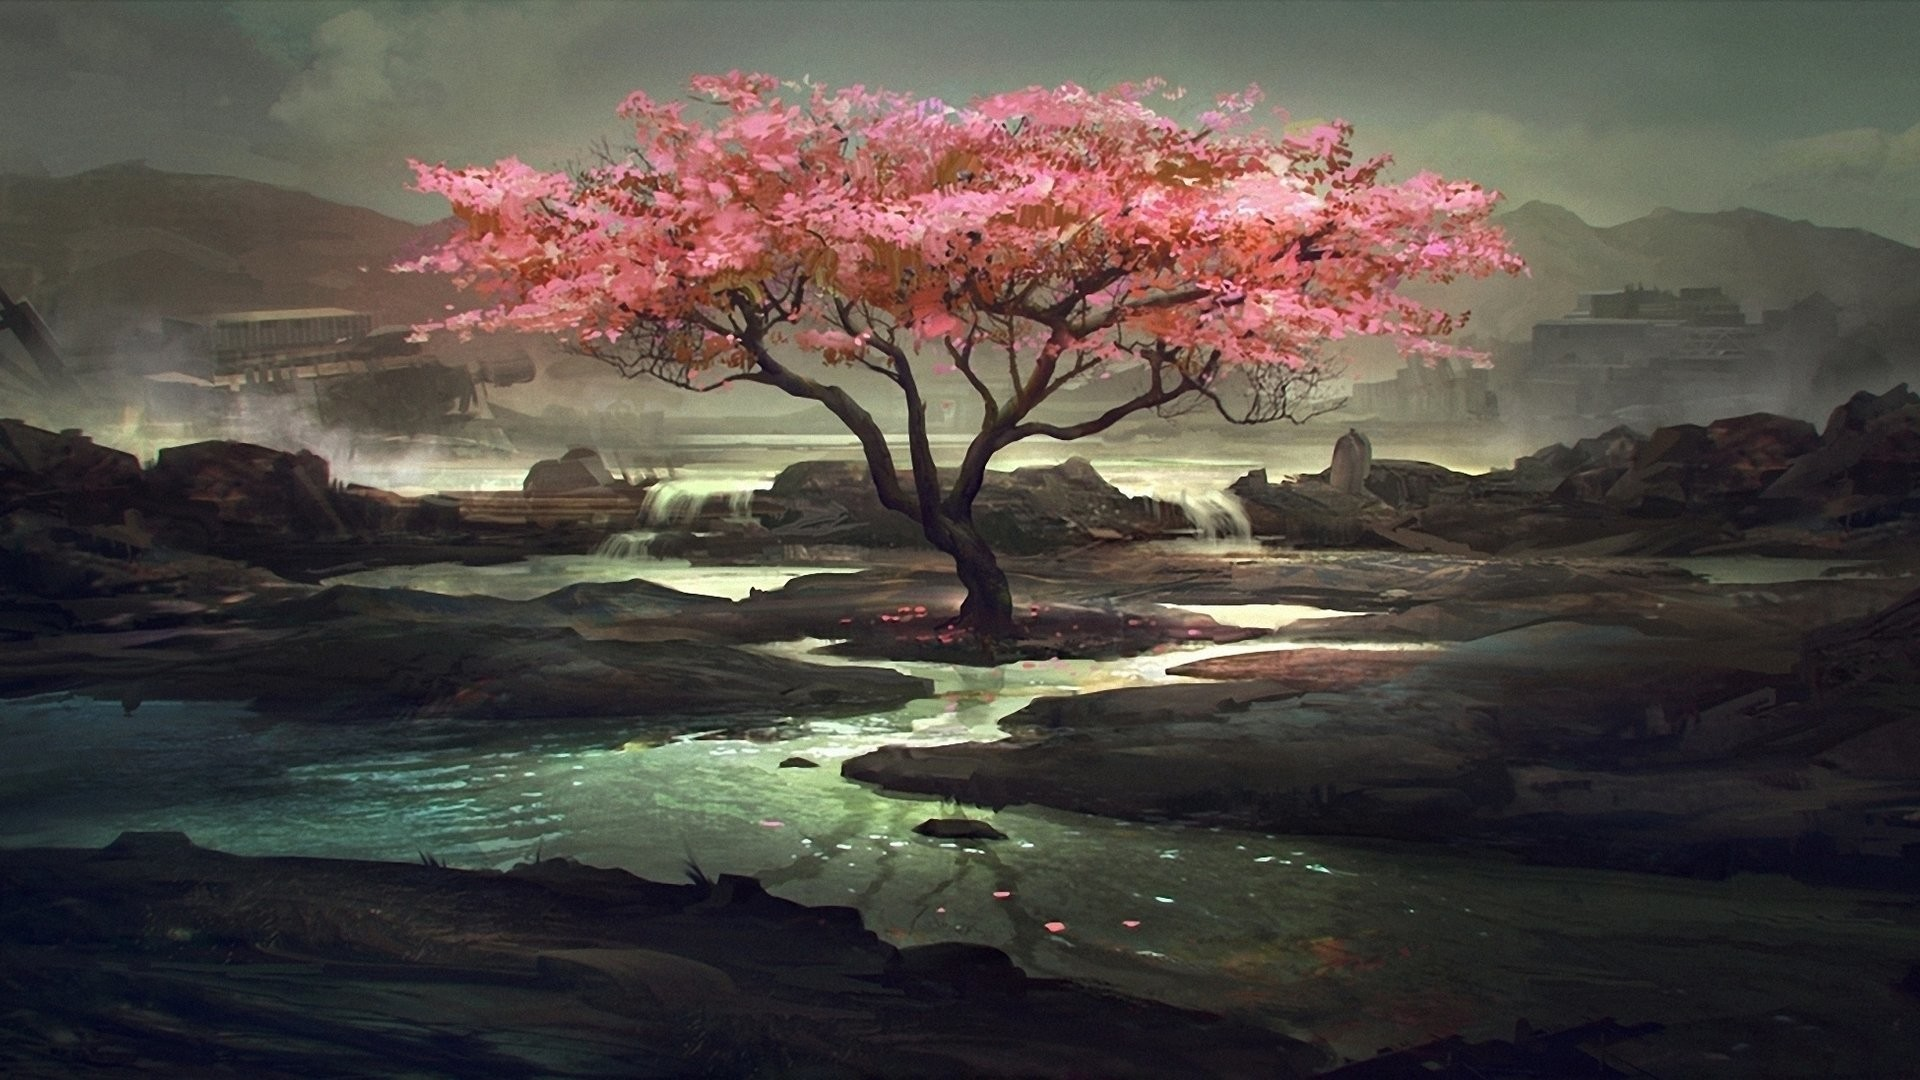 Res: 1920x1080, Artistic - Oriental Landscape Scenic Tree Flower Rock Lake Wallpaper